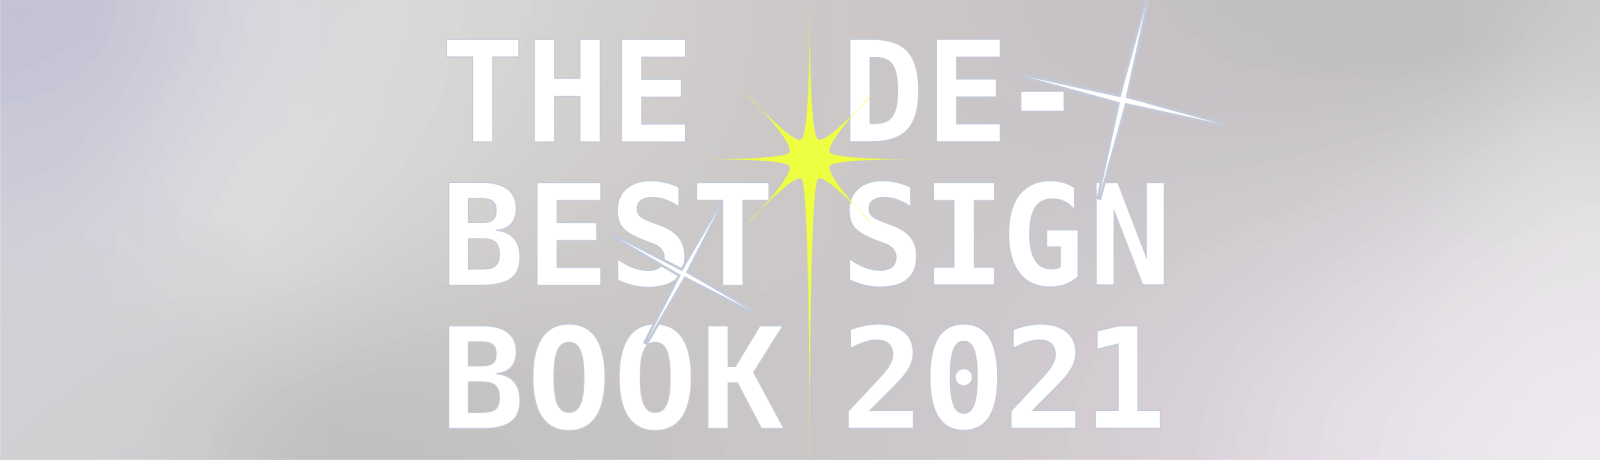 The Best Book Design Contest